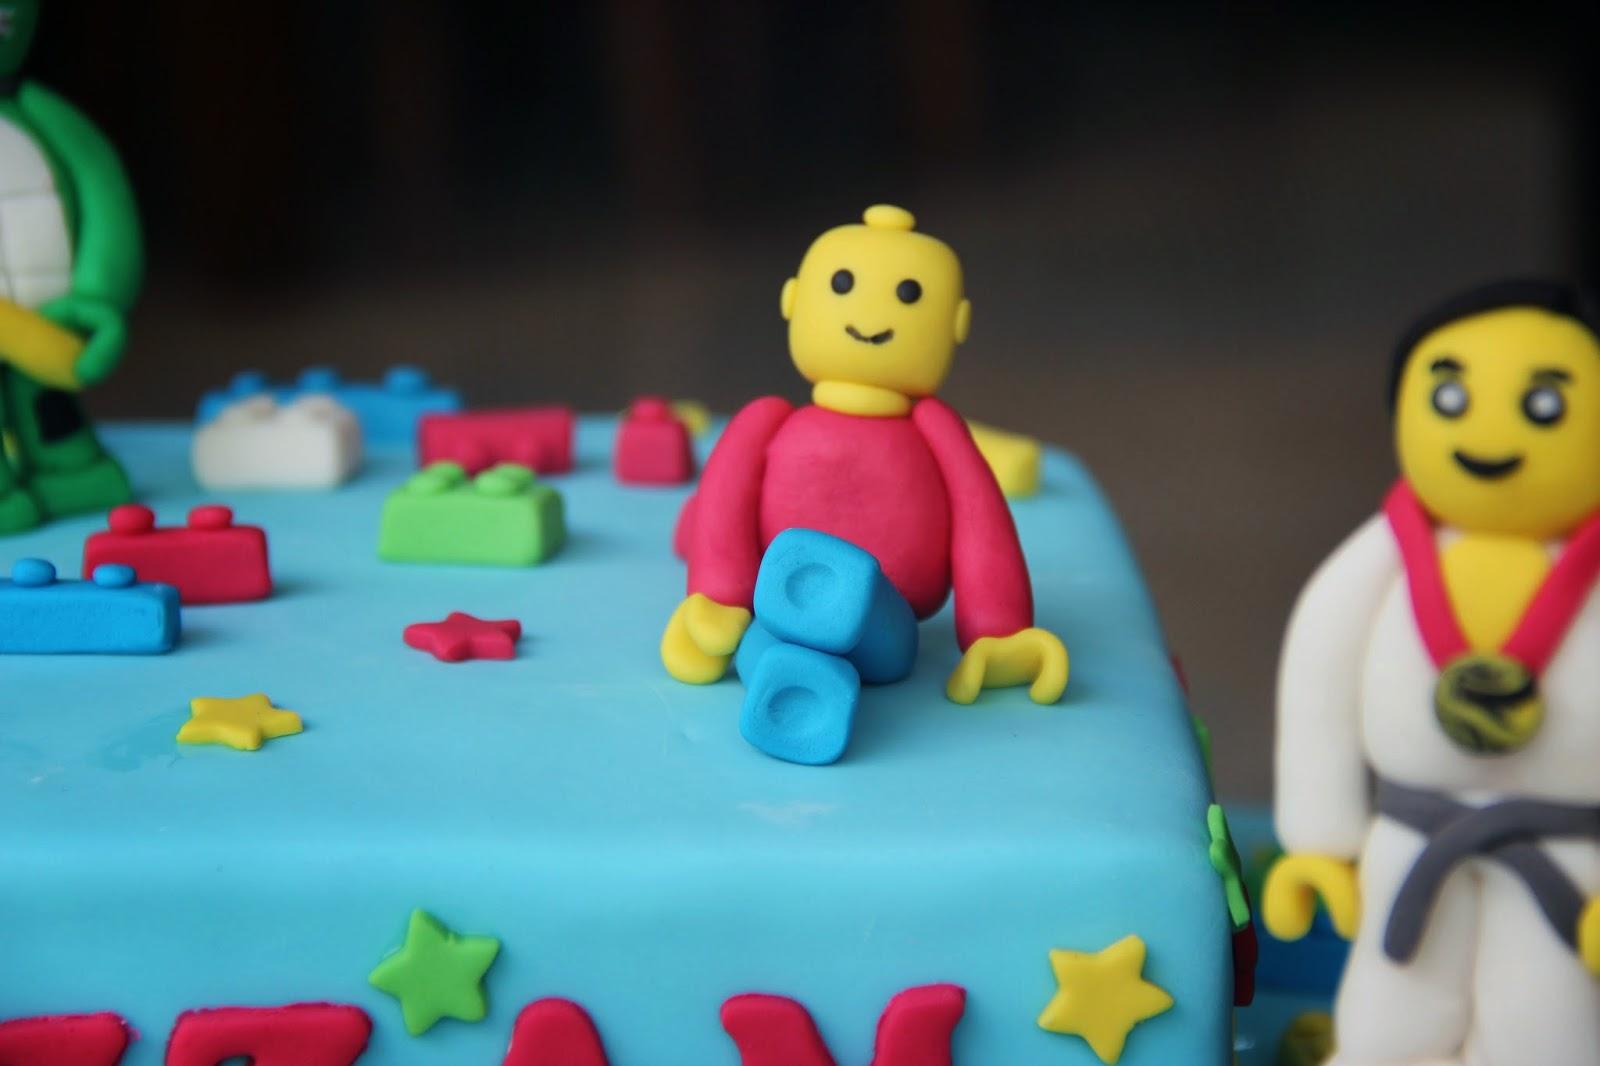 Kue Lego, Figurine kecil-kecil ala Lego